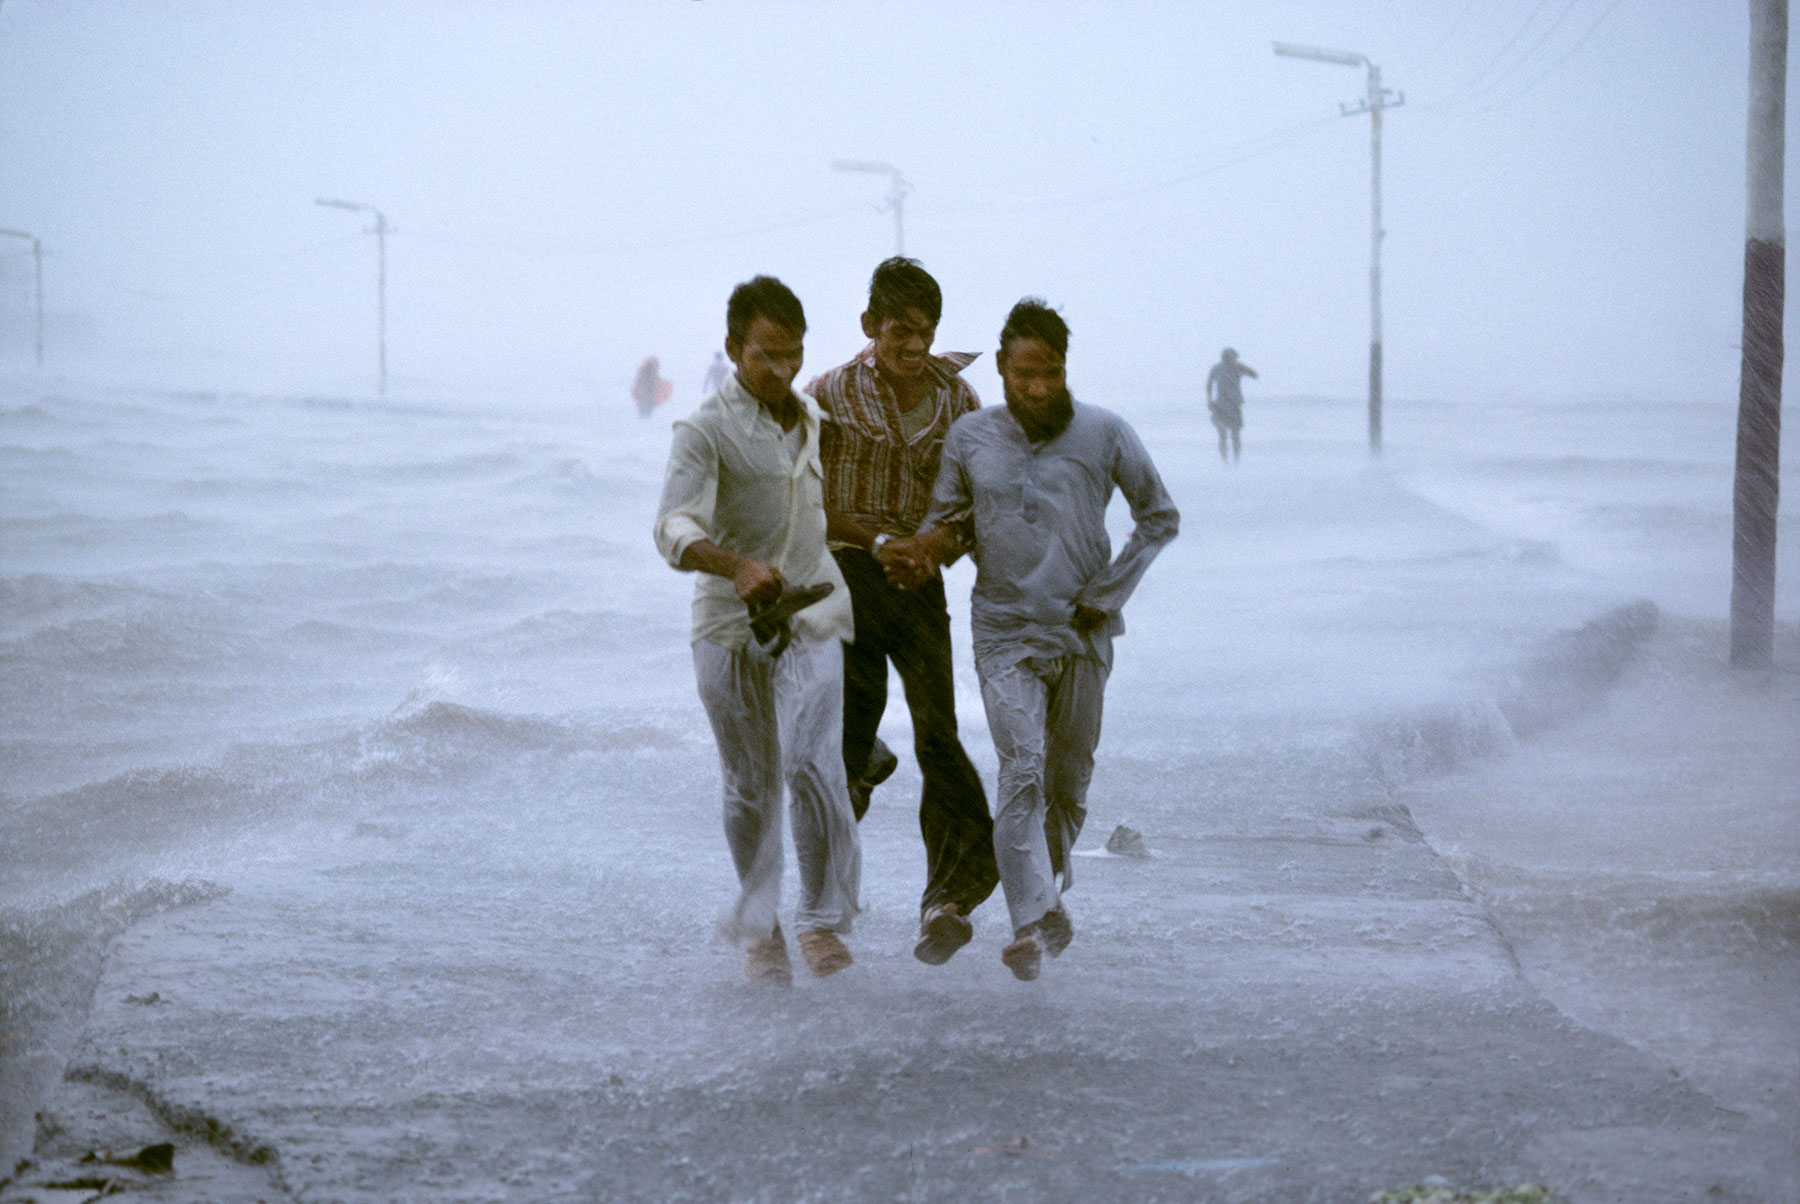 no-mad-india-steve-mccurry-monsoon-4